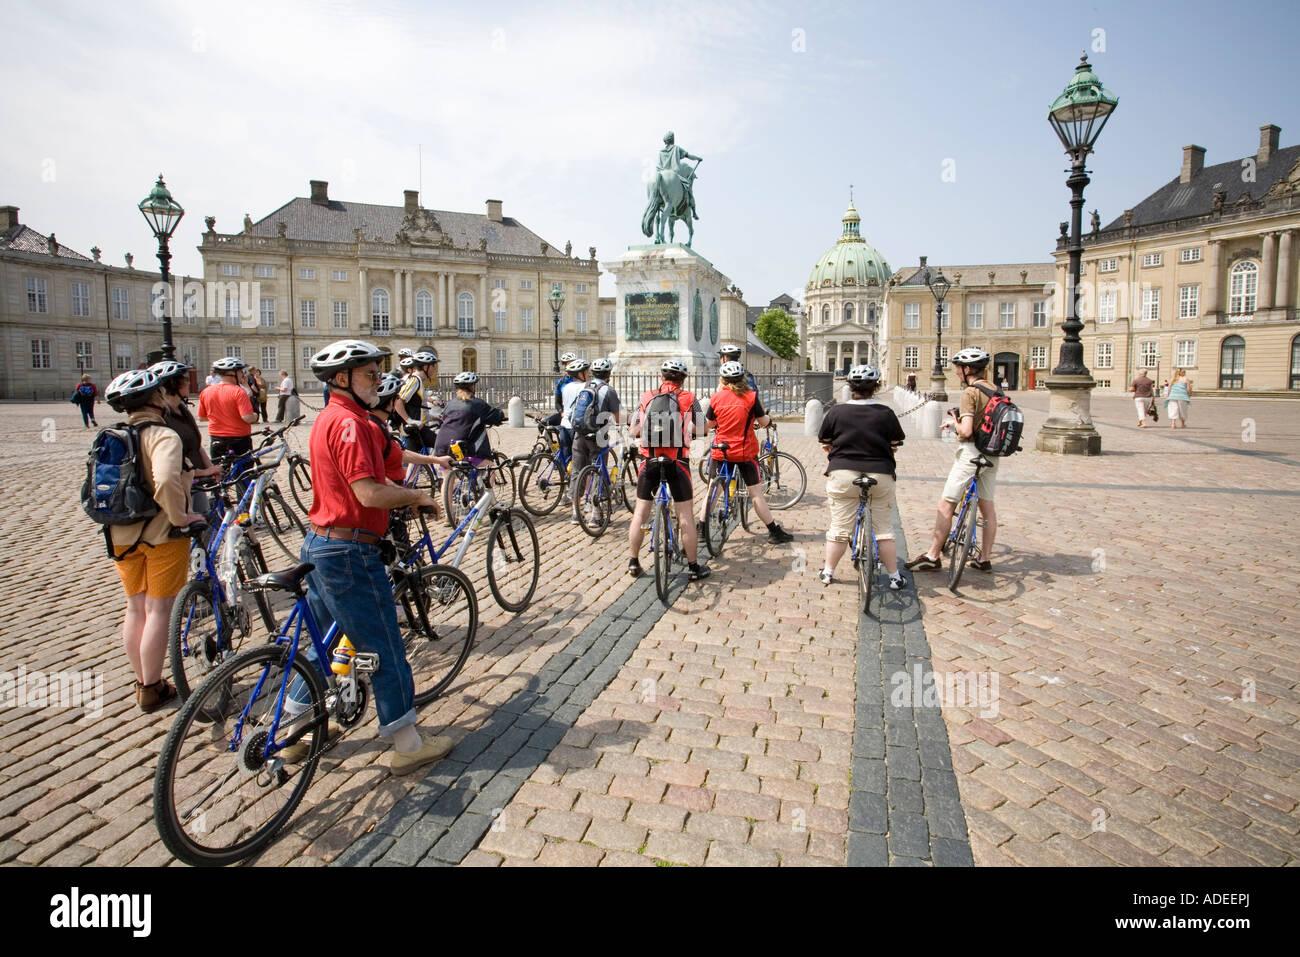 Cyclists on a sightseeing tour of Copenhagen visit Amalienborg Palace - Stock Image